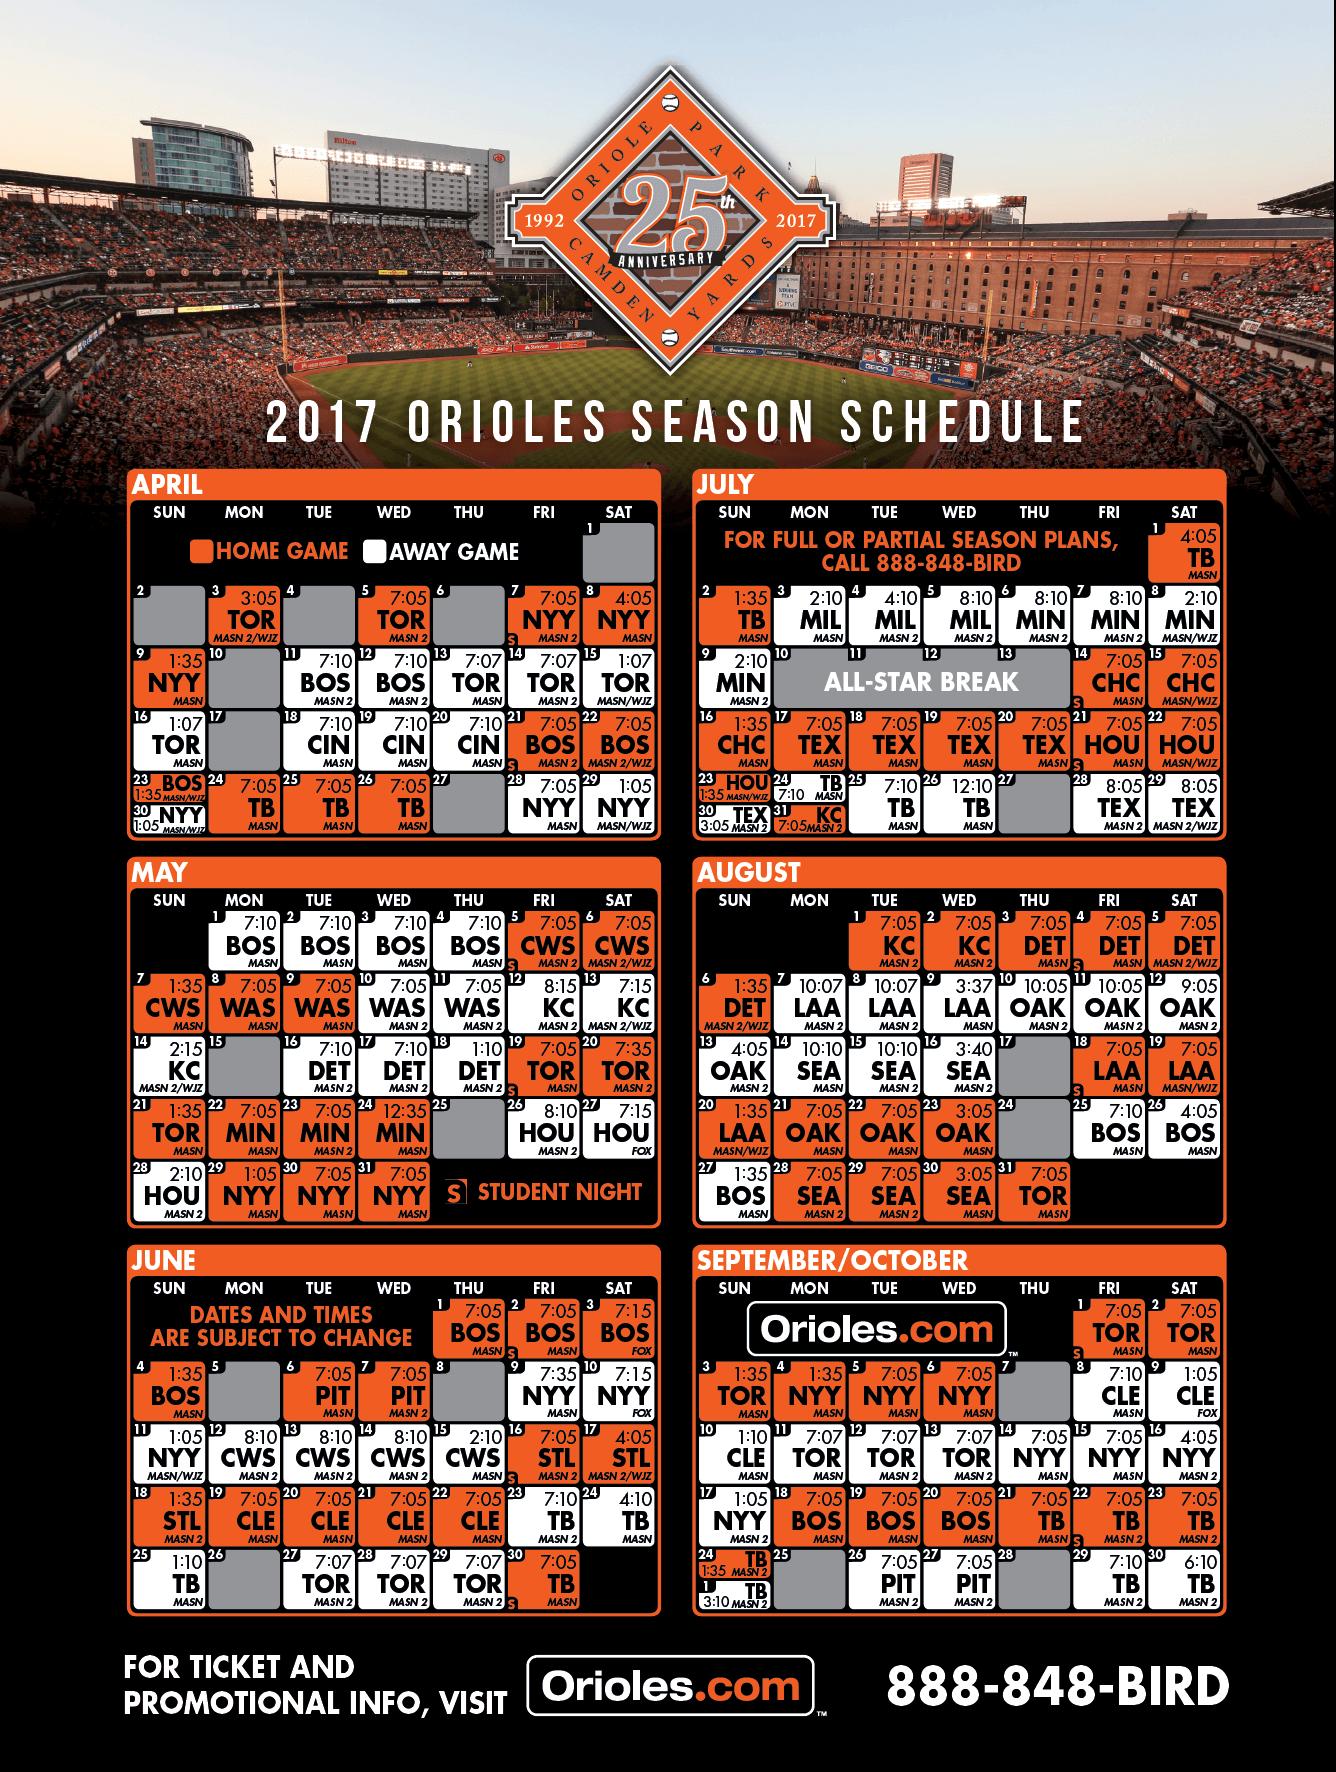 Baltimore Orioles 2017 Season Schedule